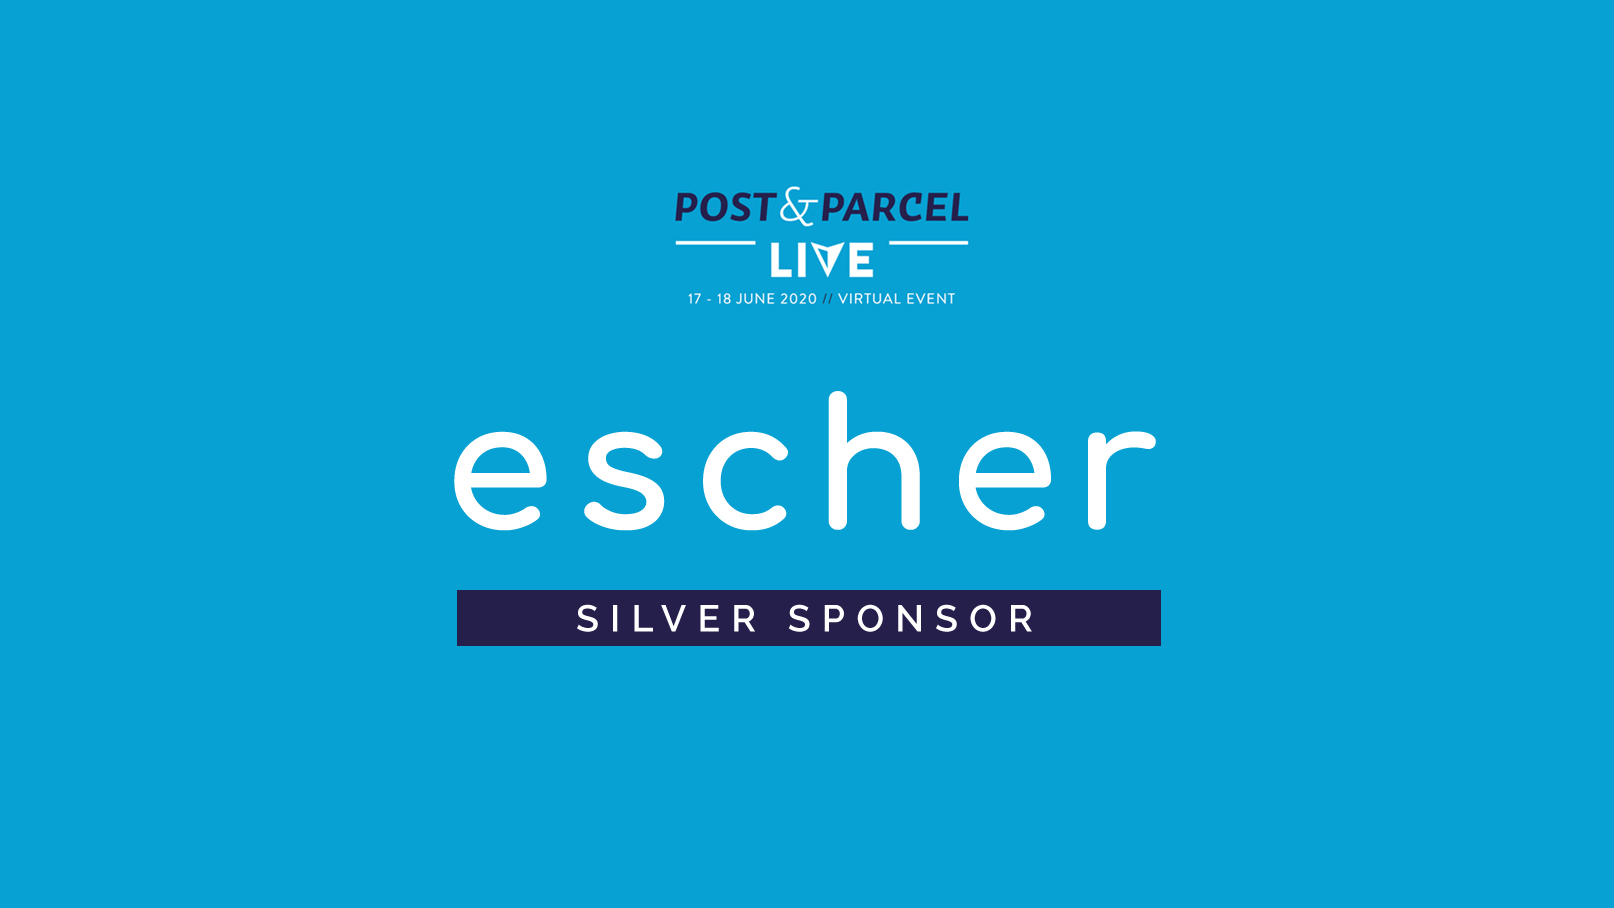 Post and Parcel Live 2020 Escher